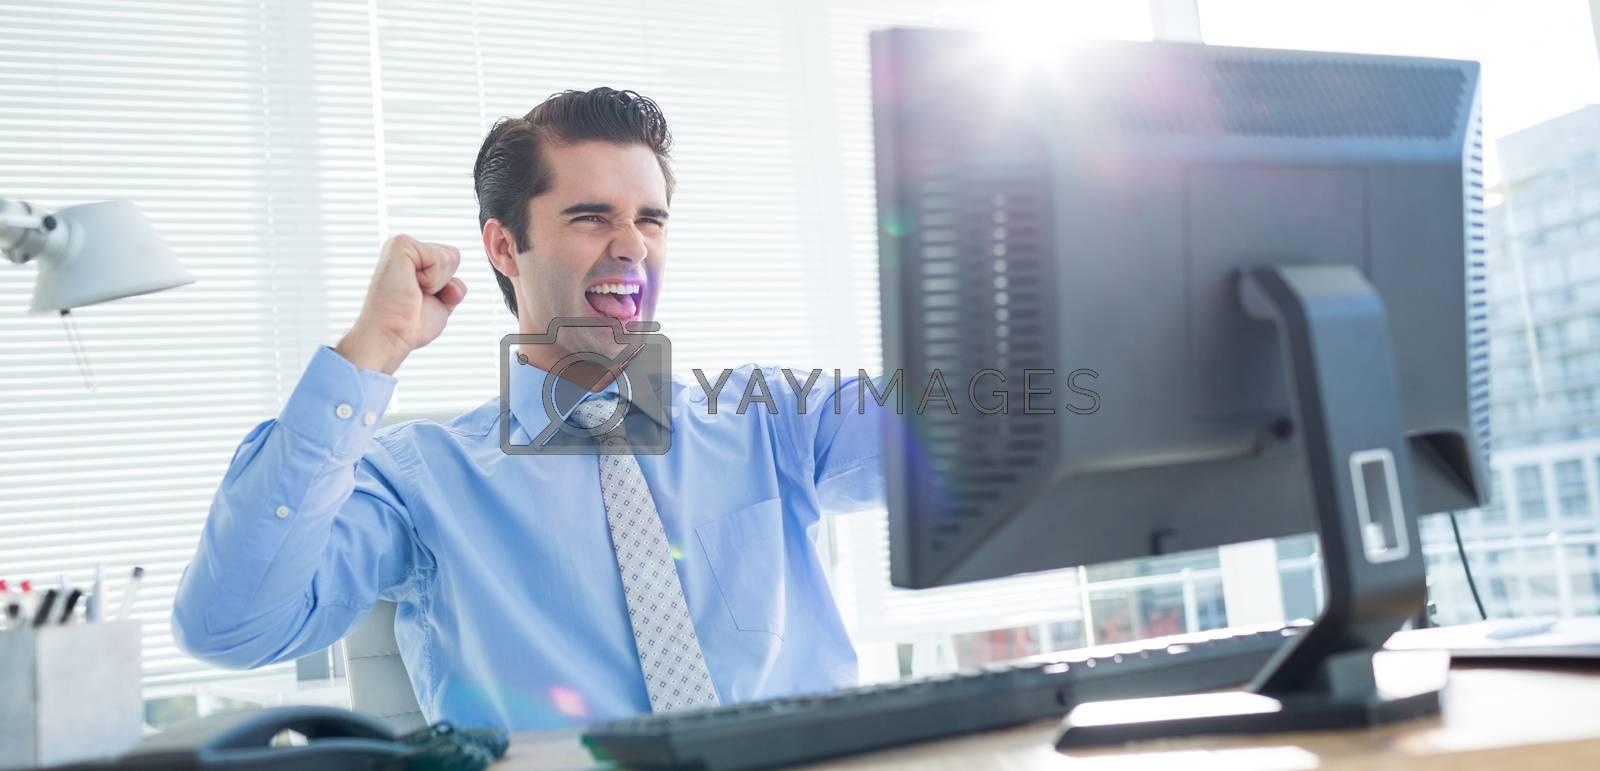 Royalty free image of Cheerful businessman cheering in office by Wavebreakmedia